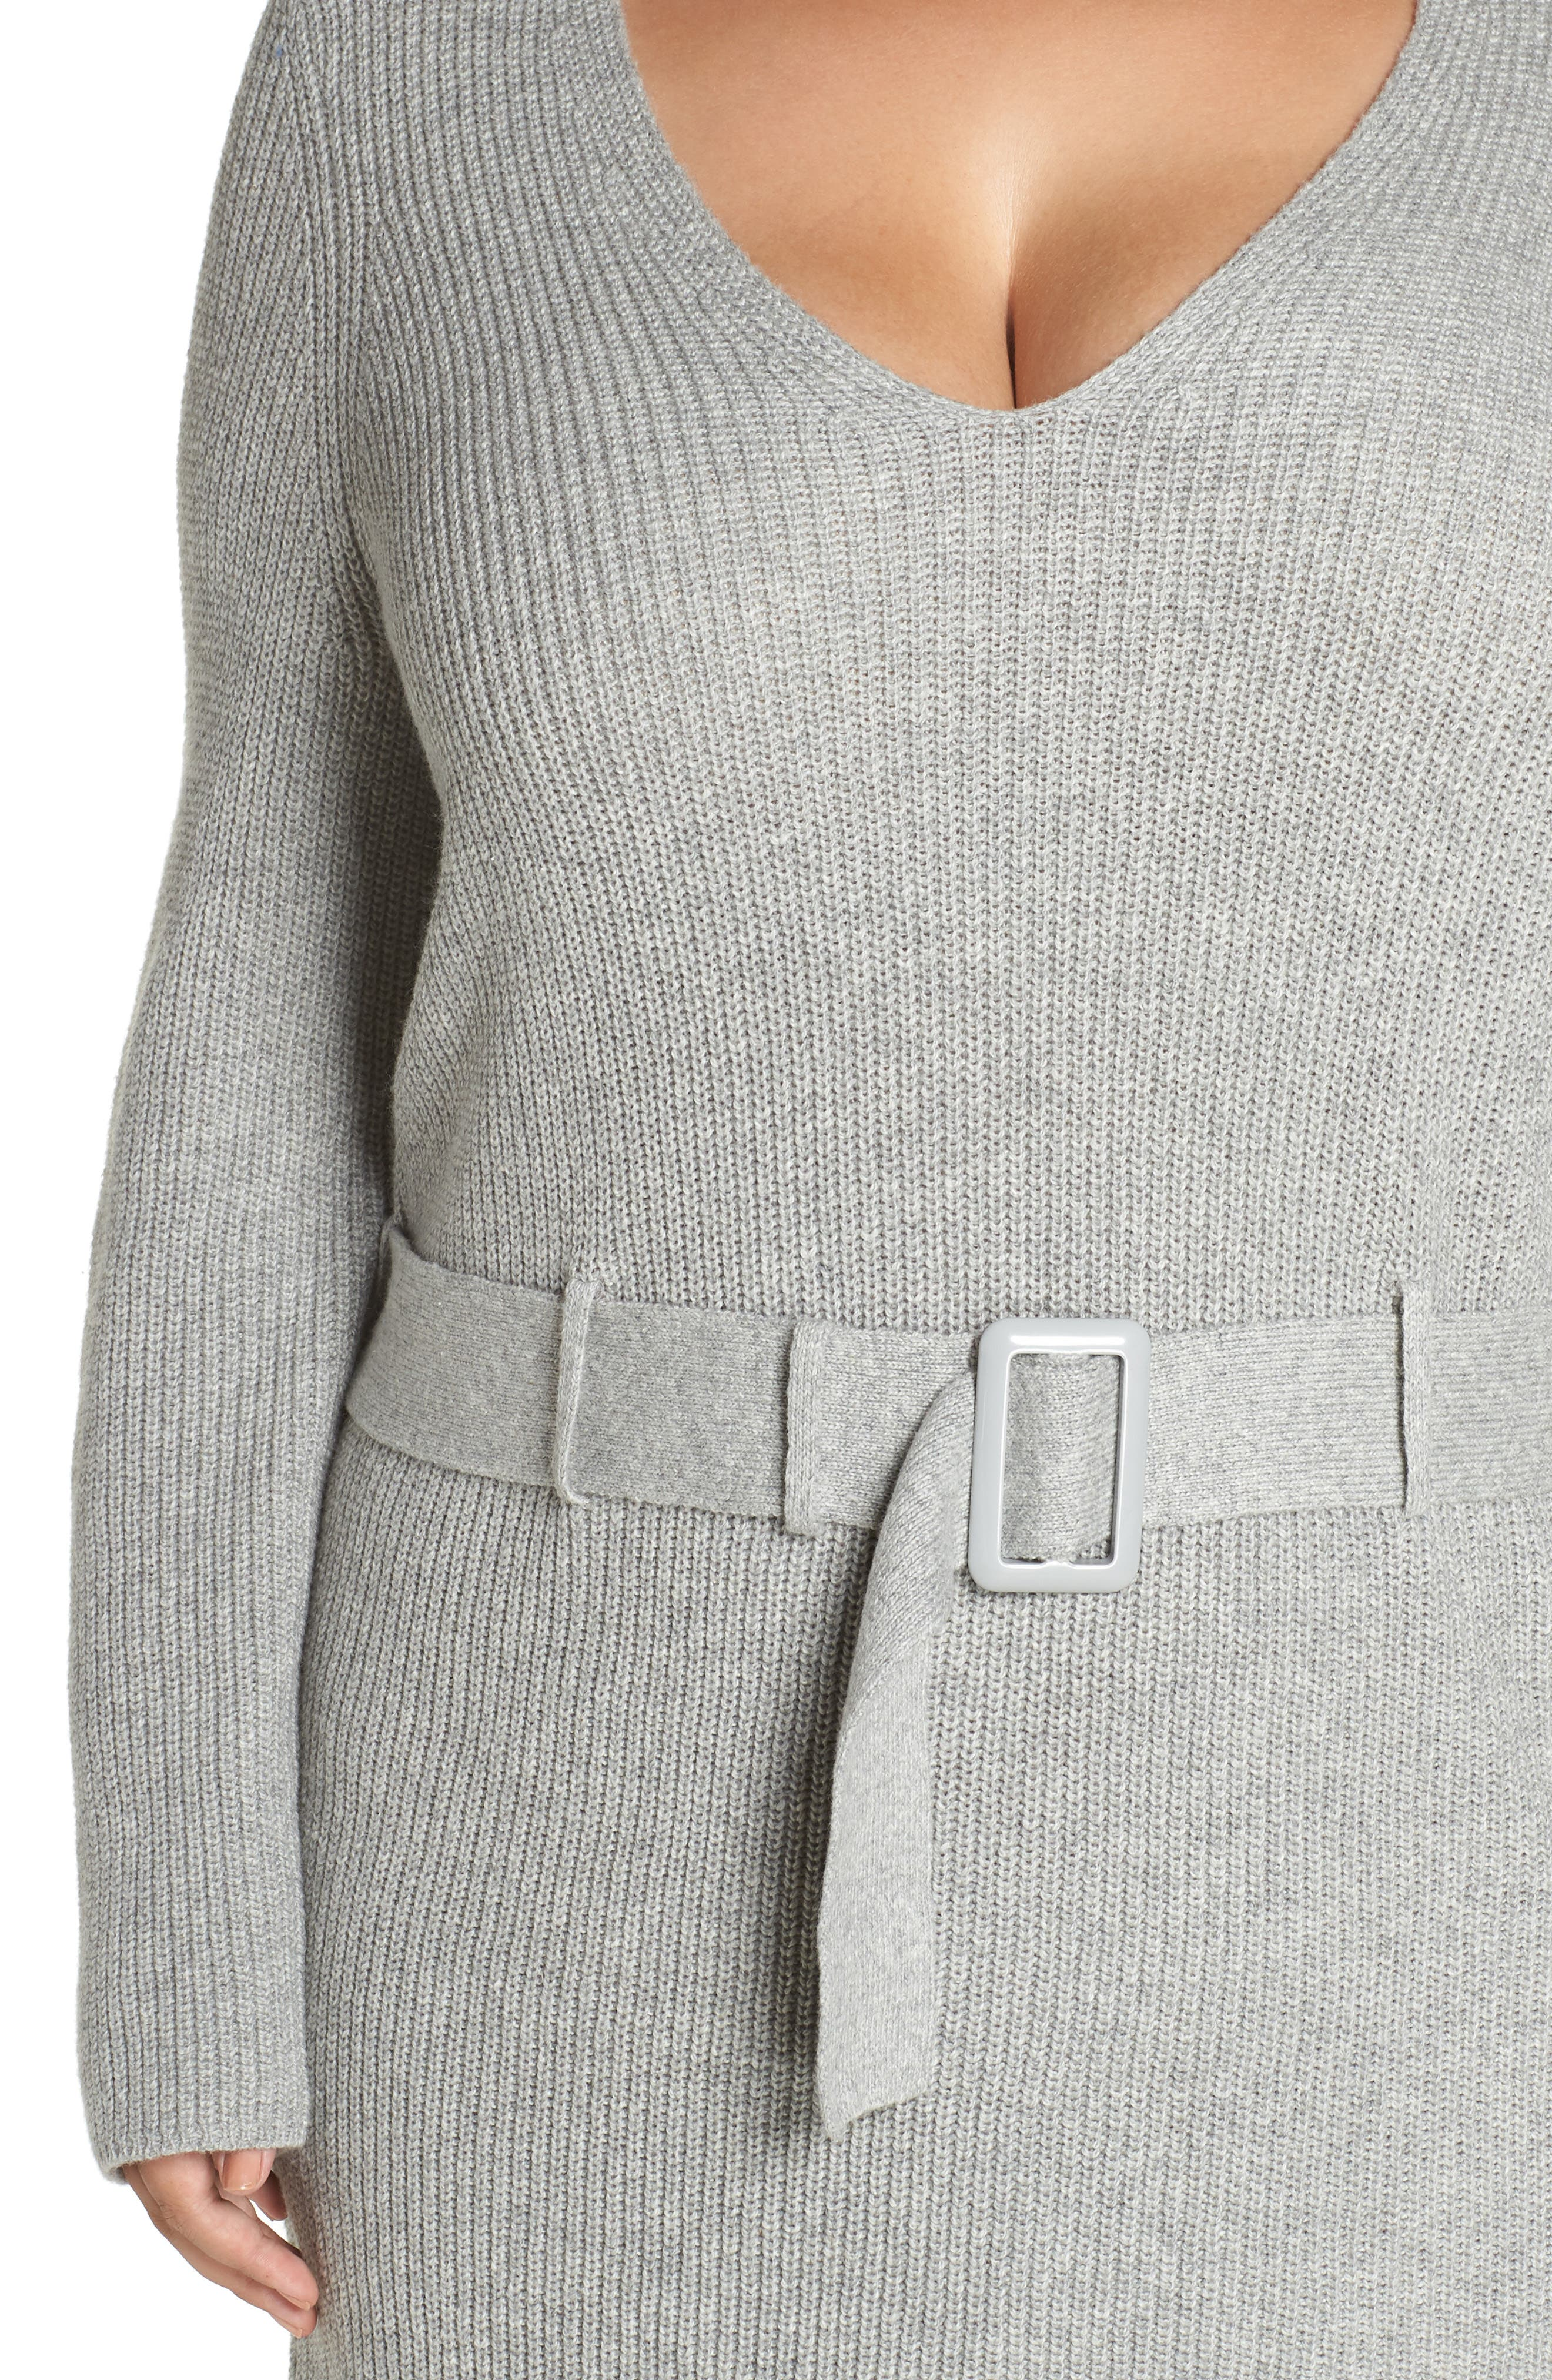 Belted Sweater Dress,                             Alternate thumbnail 4, color,                             GREY MEDIUM HEATHER